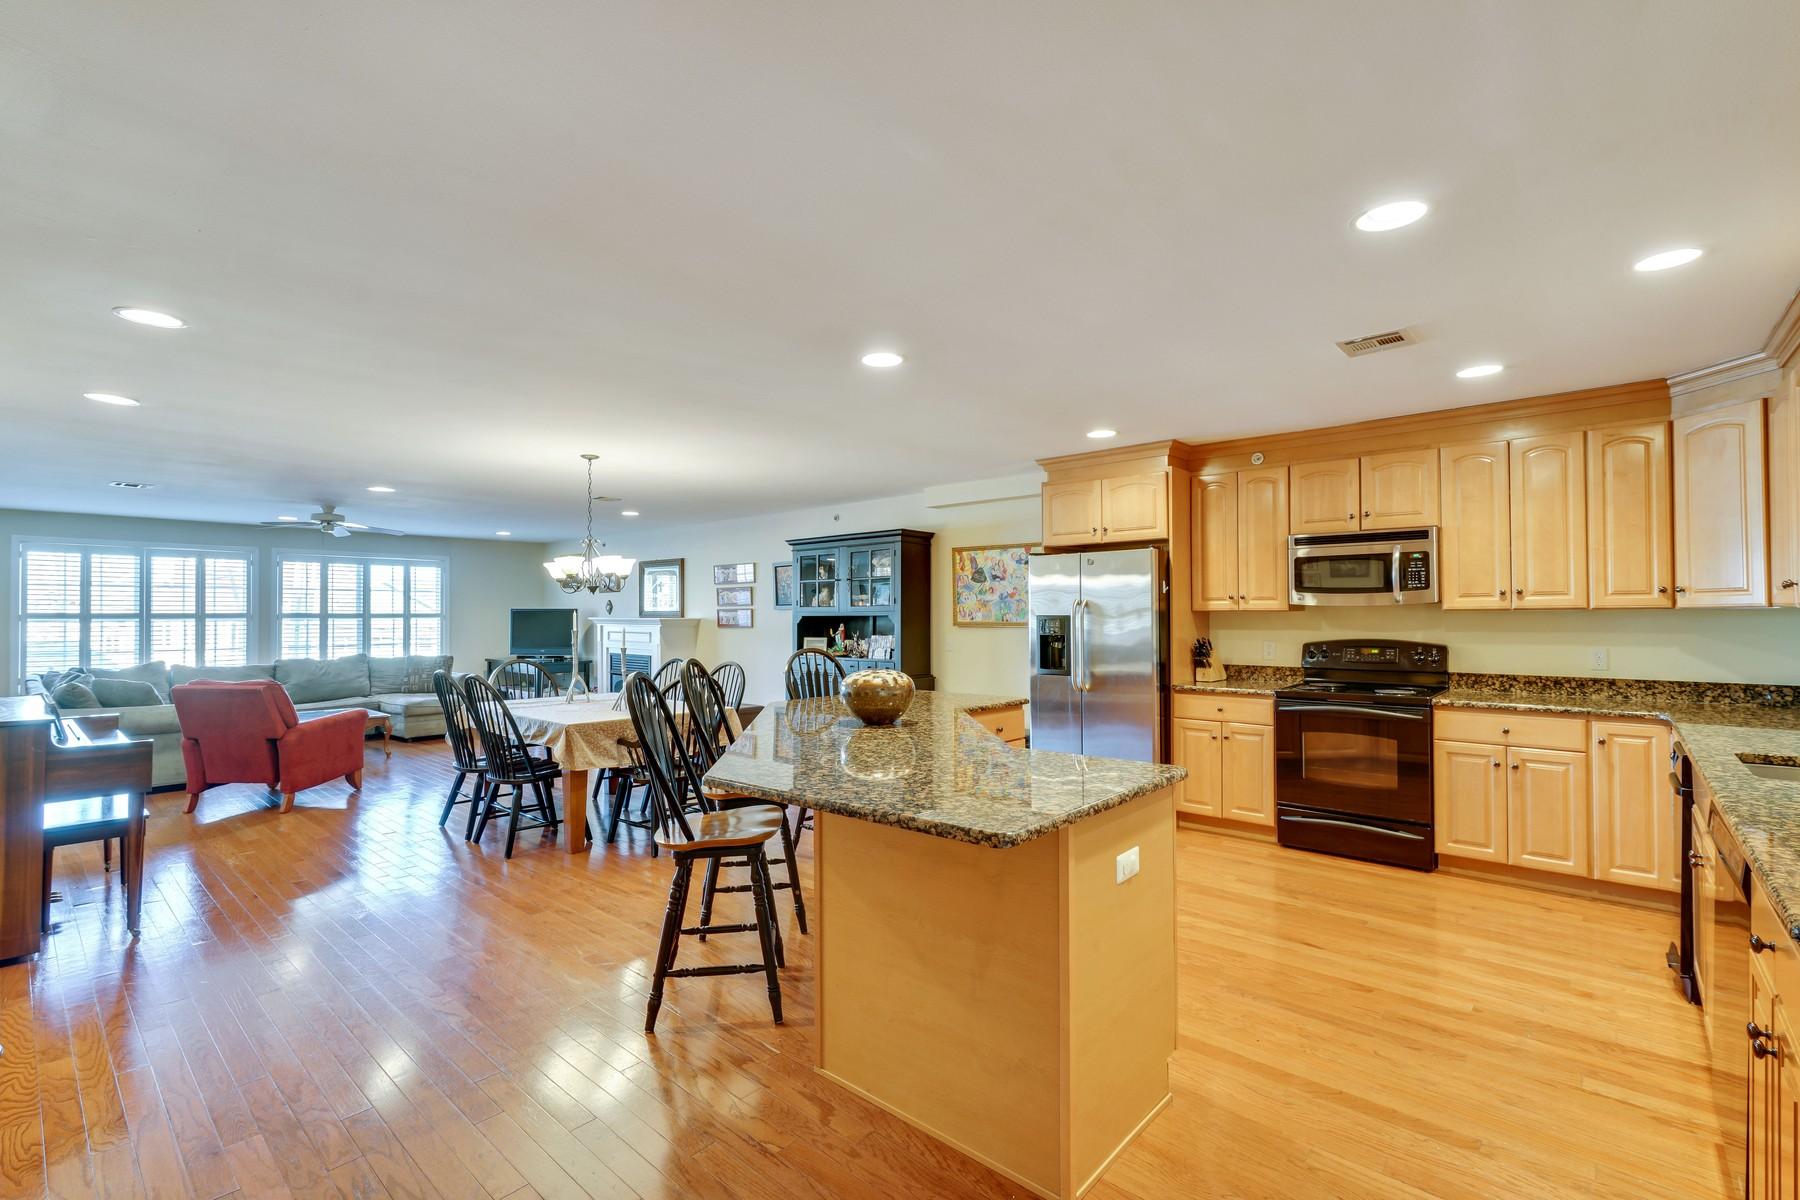 Condominium for Sale at Spacious Beach Condo 580 Main St E, 4 Manasquan, New Jersey, 08736 United States